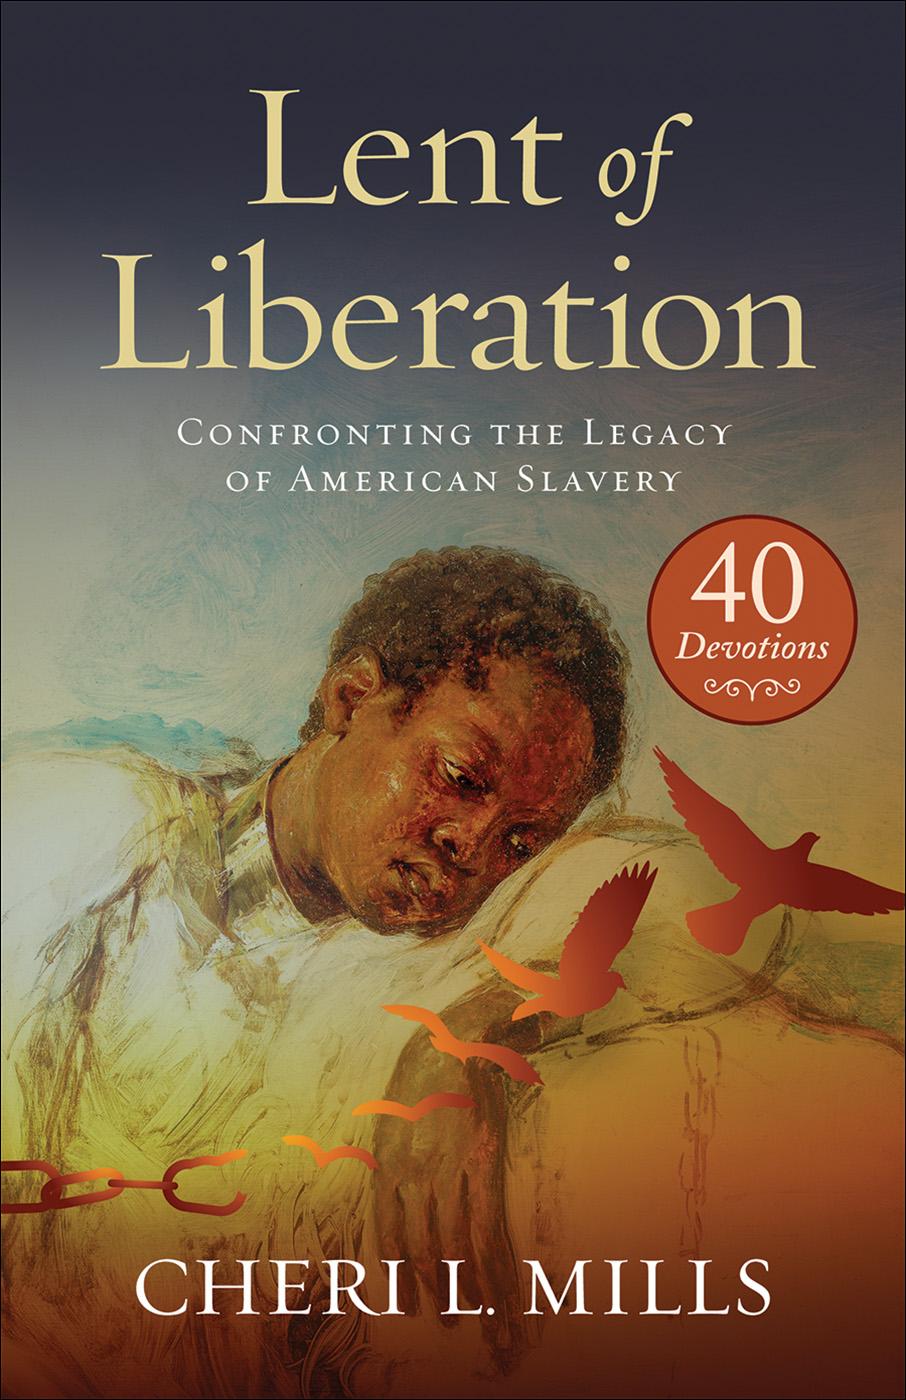 lent-of-liberation-cover-2d-for-digital-materials_263